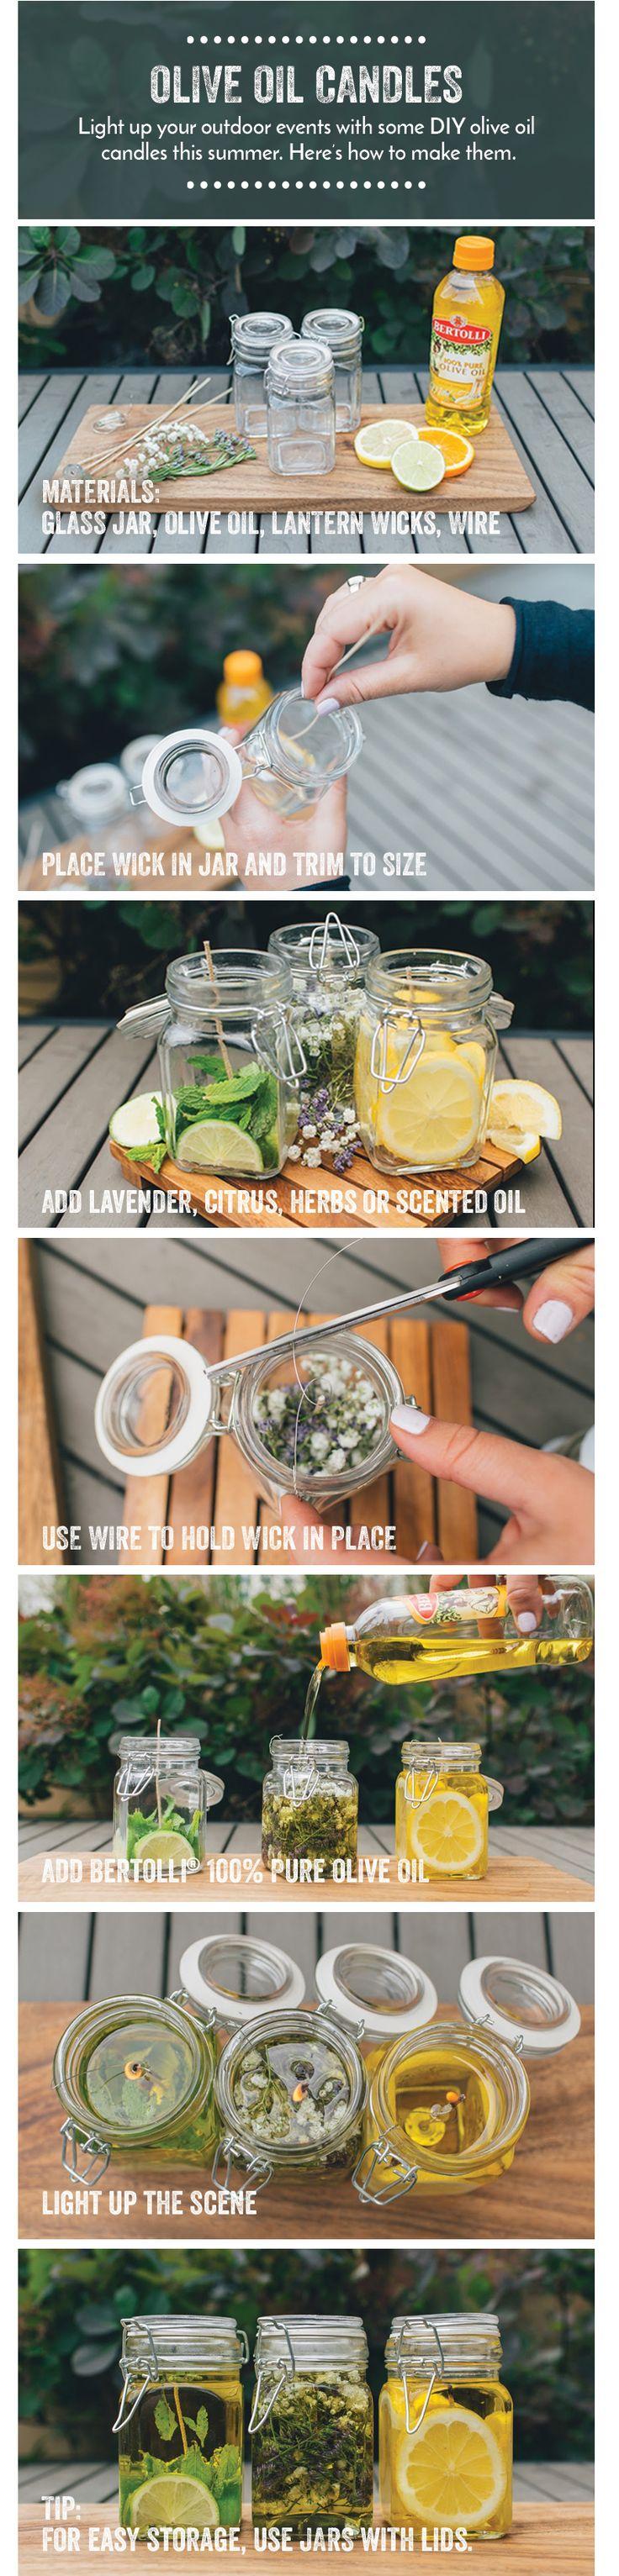 Best 25+ Oil light ideas on Pinterest | Citronella oil, DIY candle ...